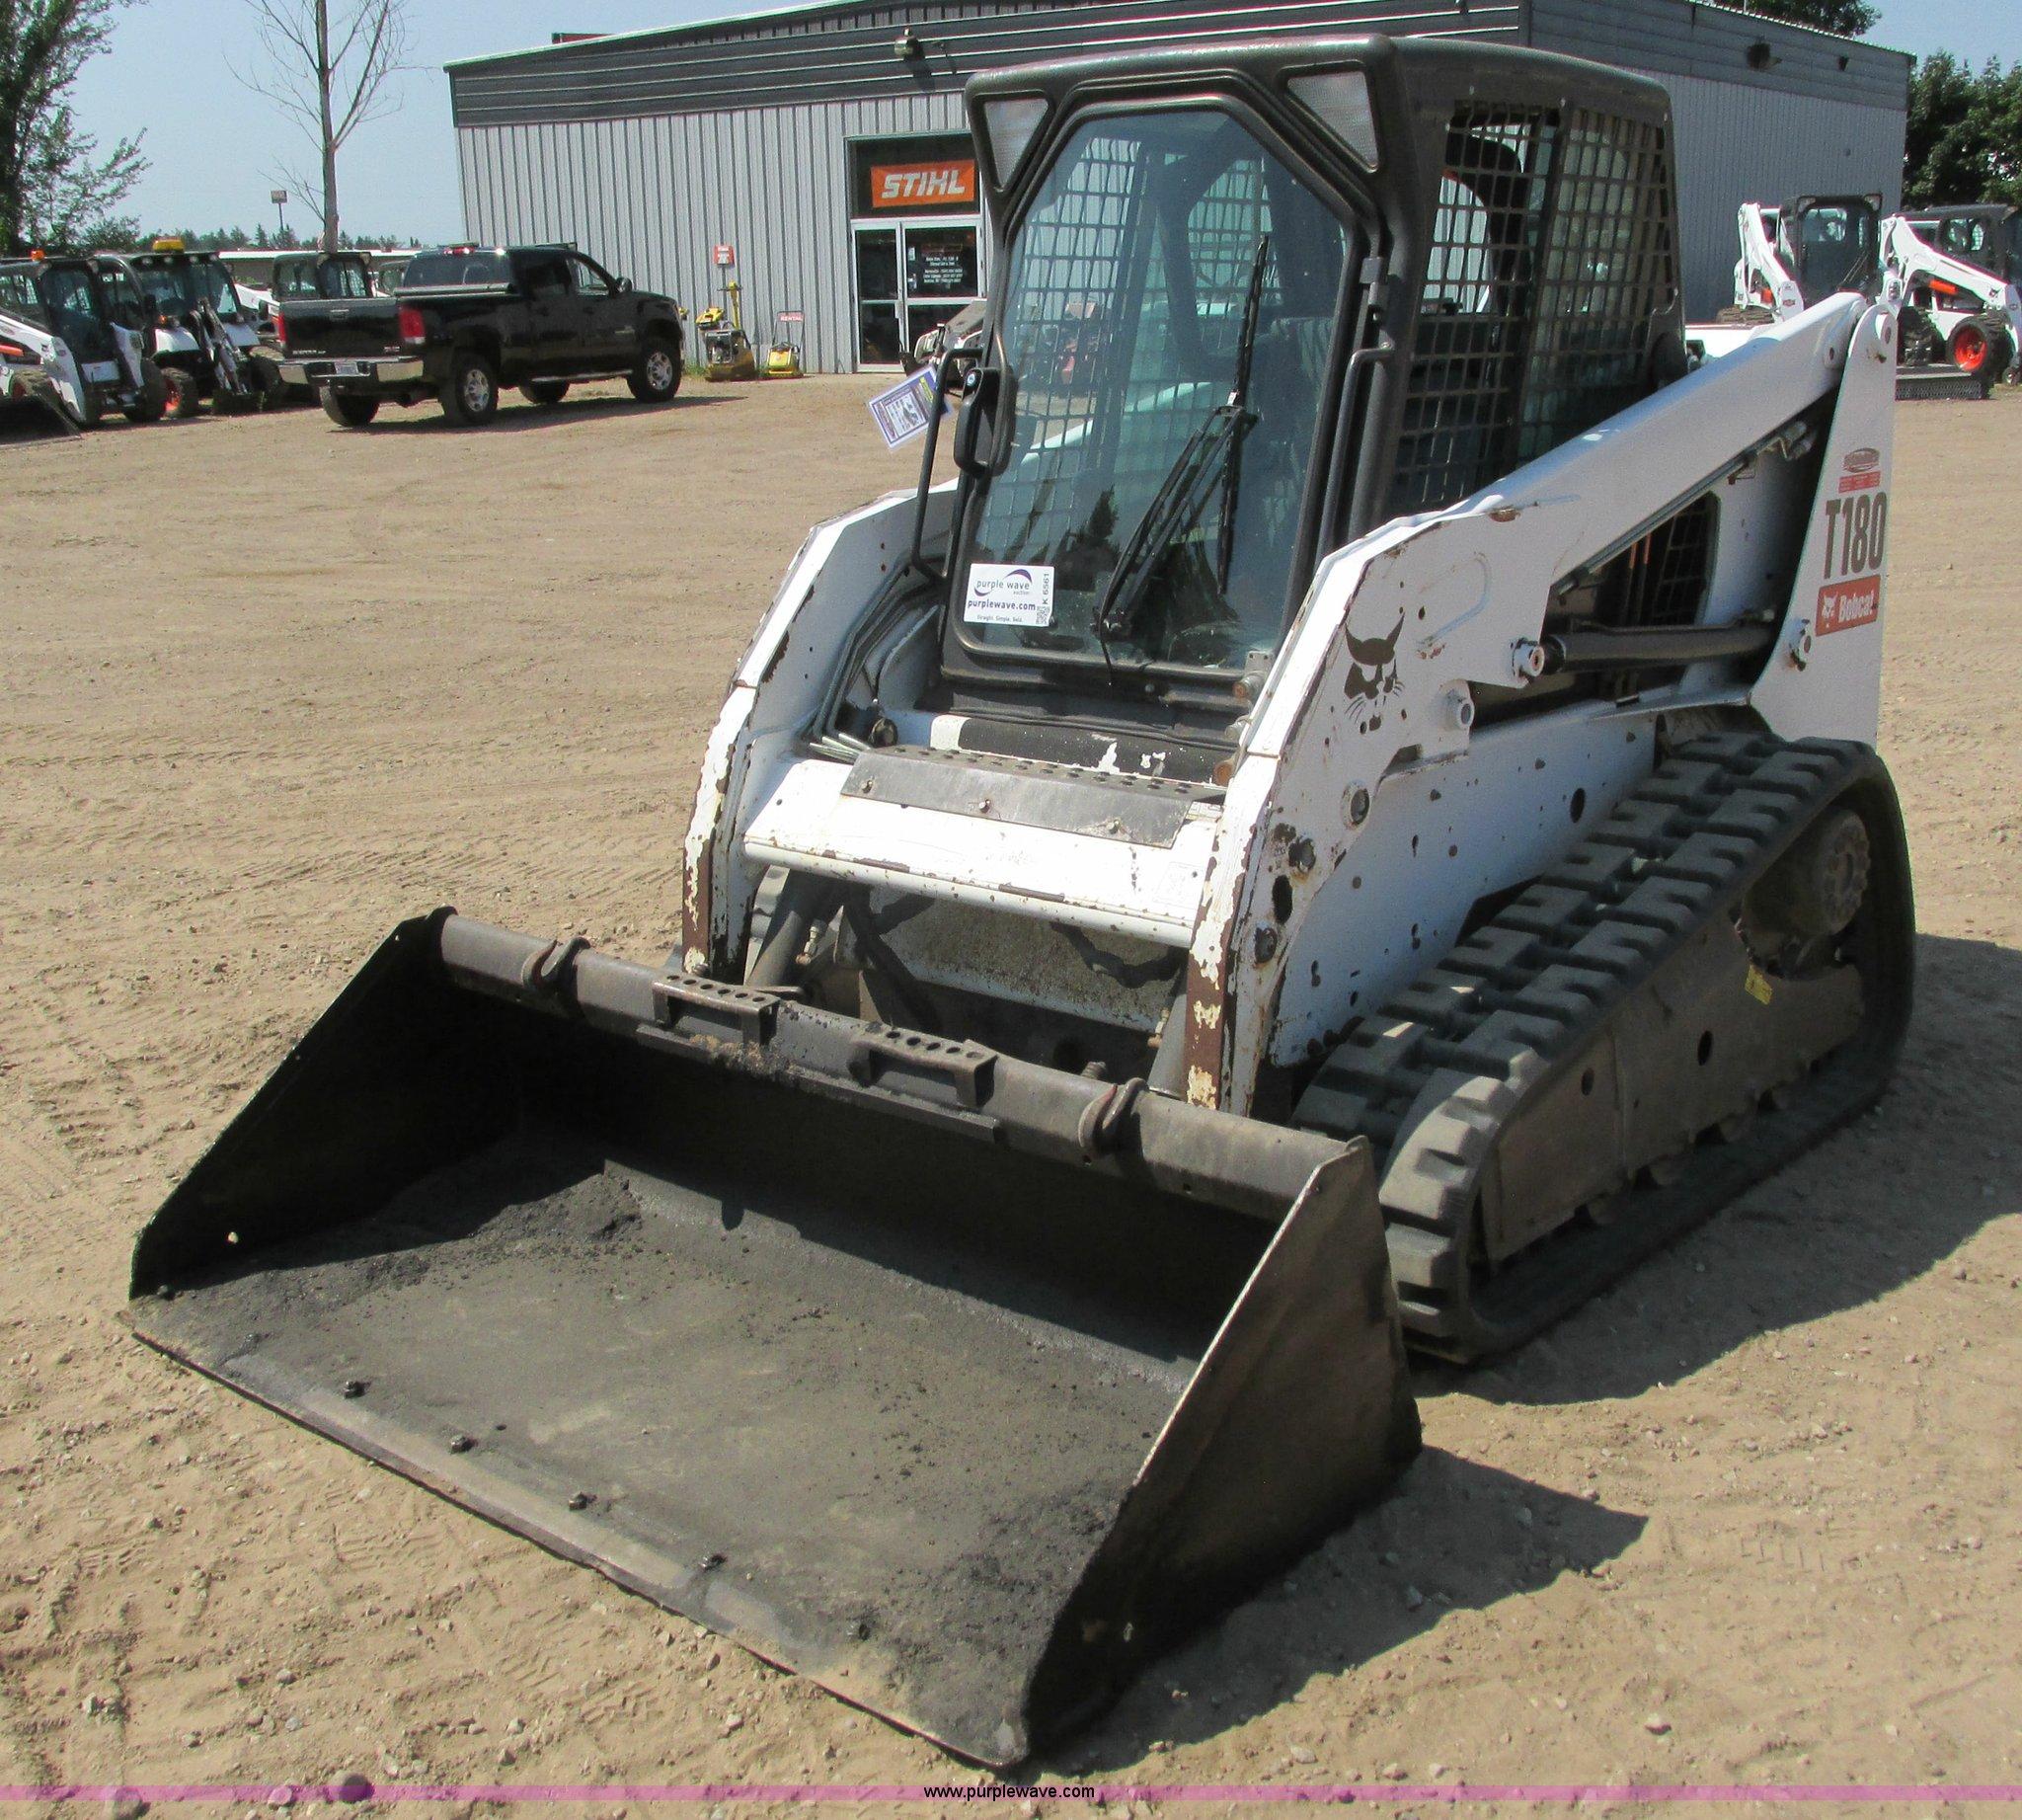 2012 Bobcat T180 skid steer | Item K6561 | SOLD! September 1